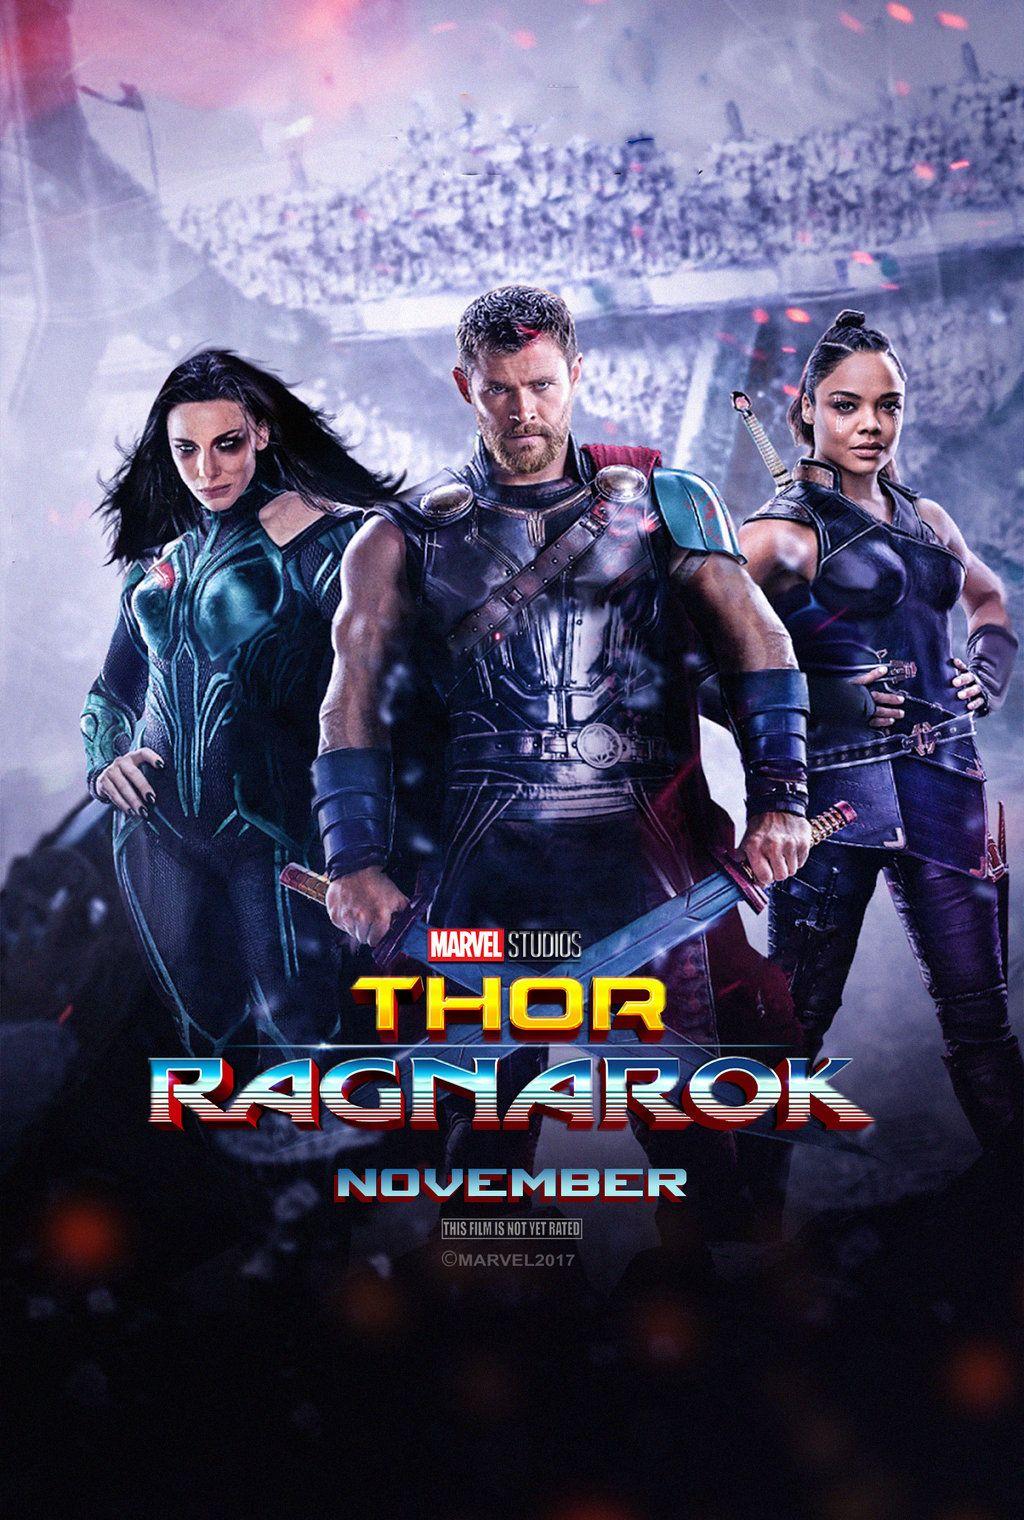 123Torrent! Watch Thor: Ragnarok [2017] Full.Movie Online Free Streaming MEGA@HD~All Quality | Thor ⚔️ ️ | Cómics. Cine